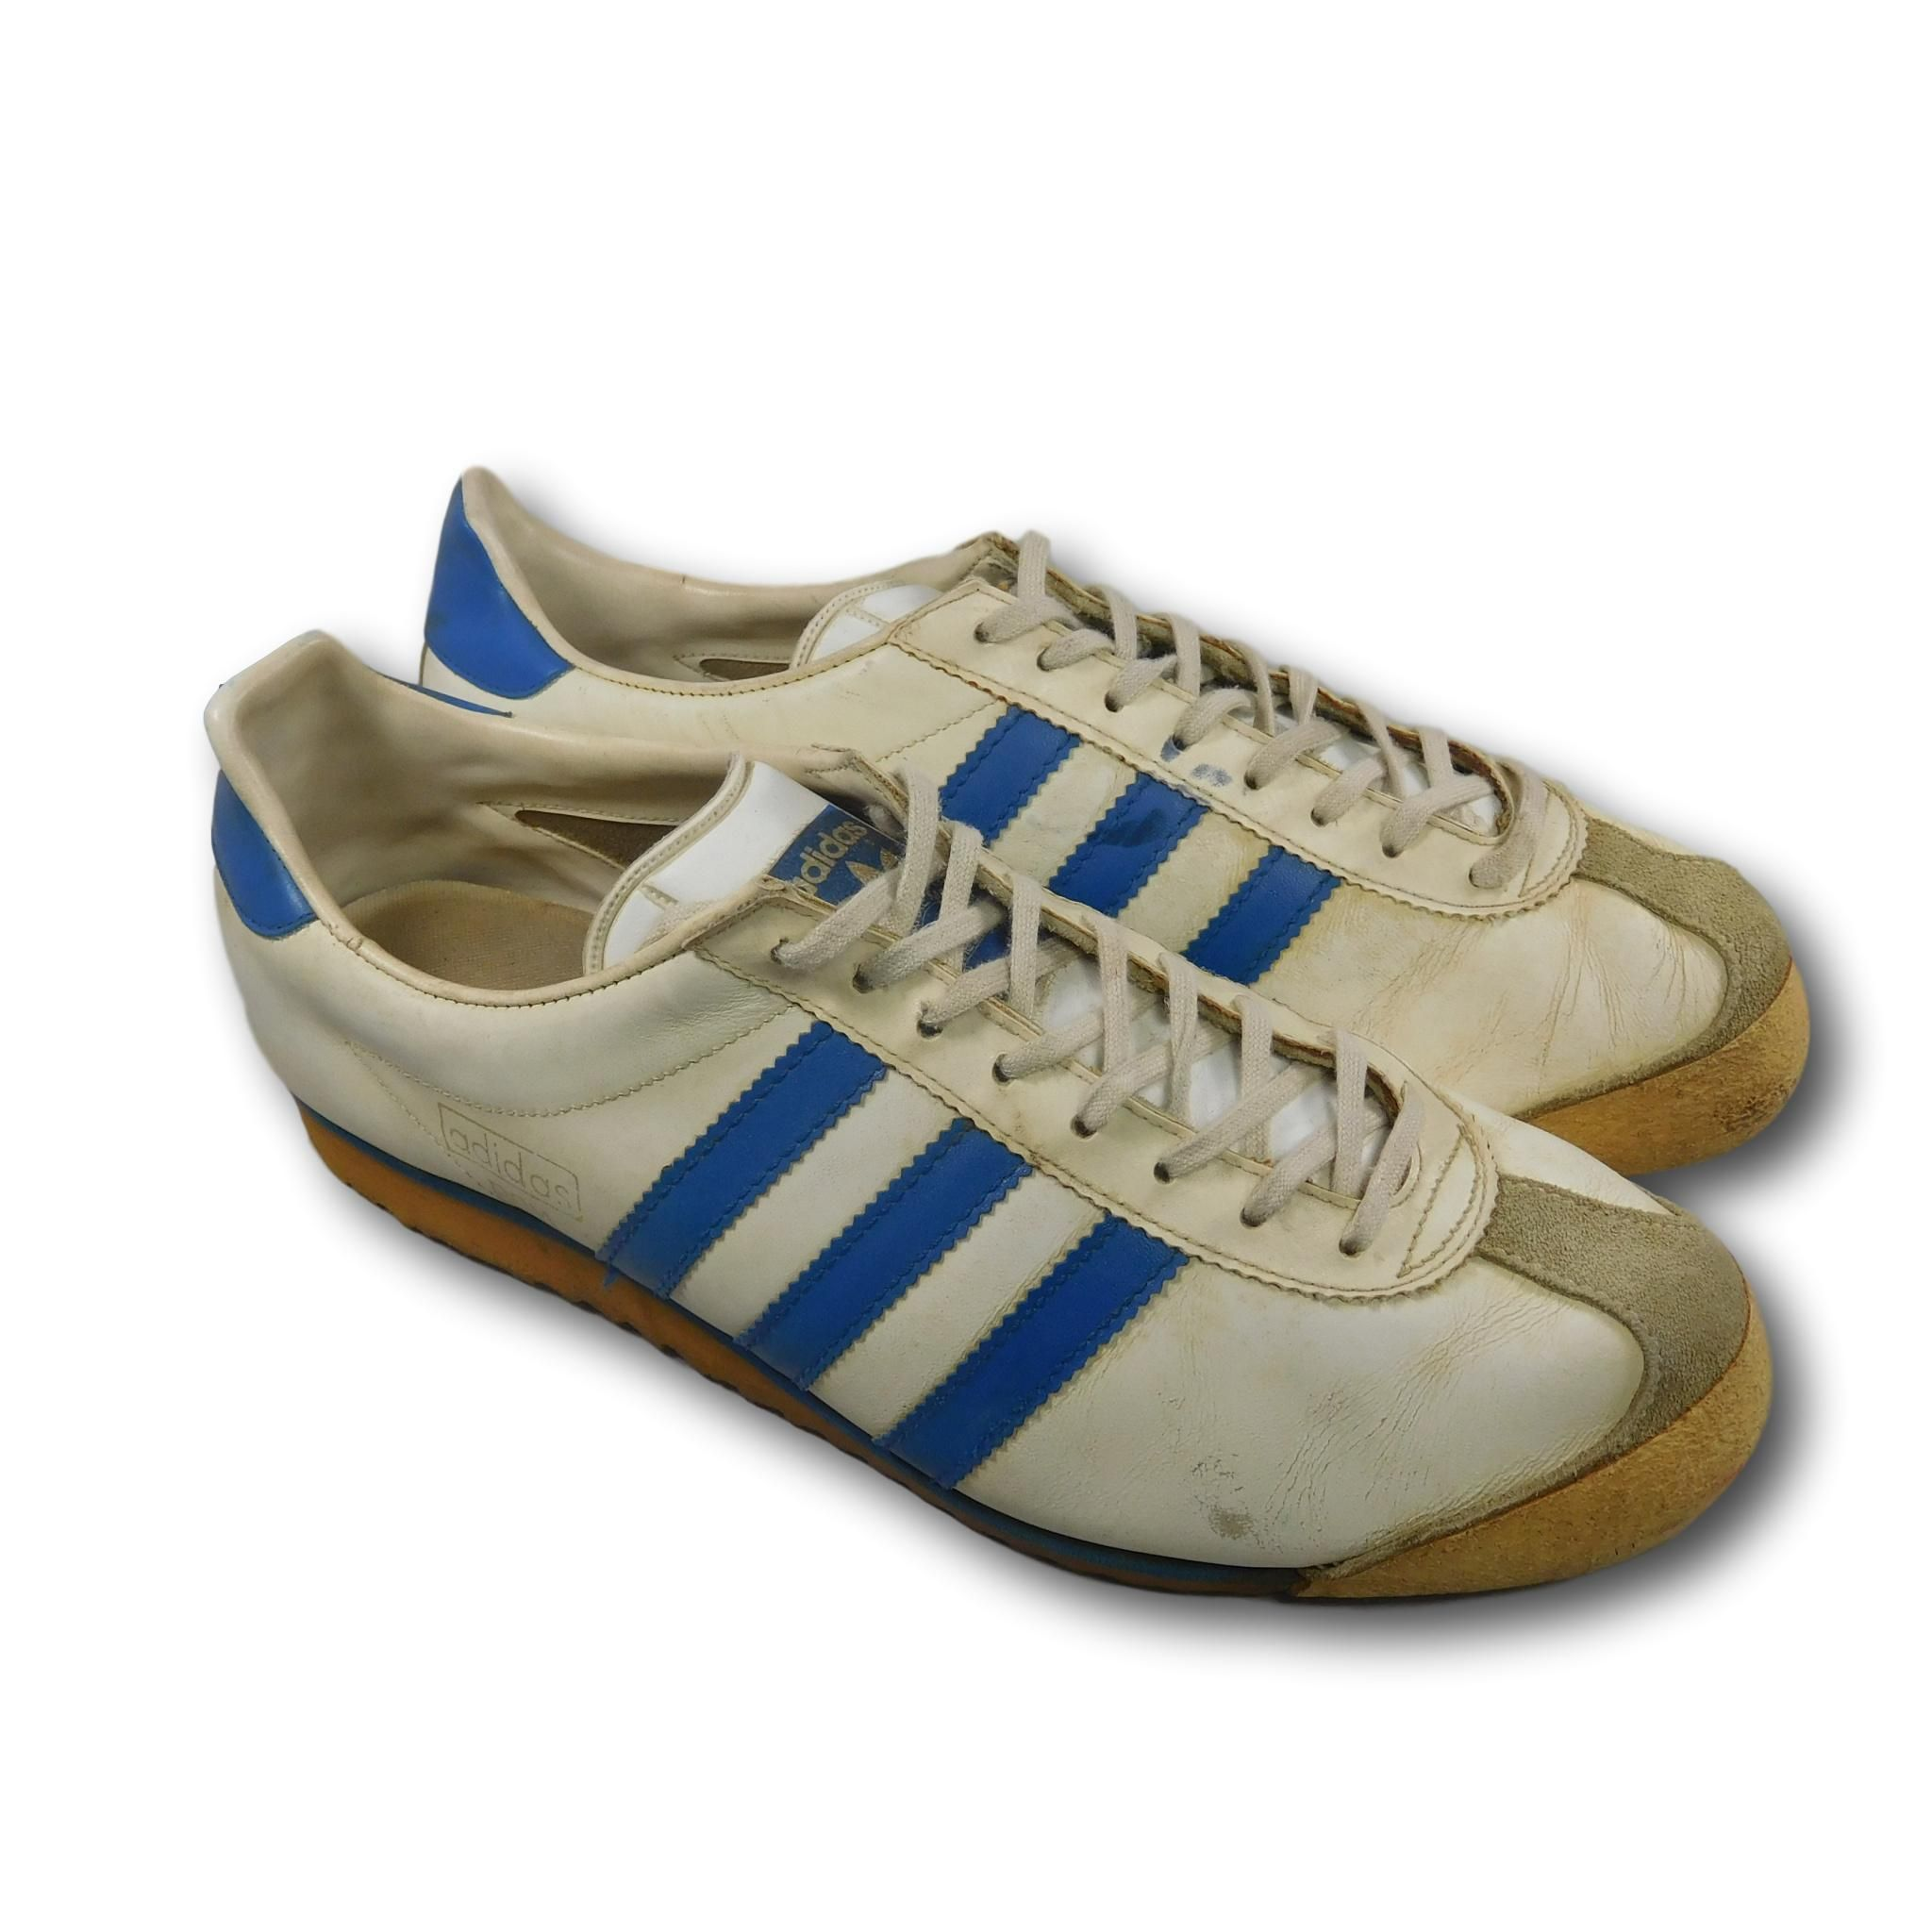 Adidas Rom 2000. Made in Yugoslavia. Release: 1985